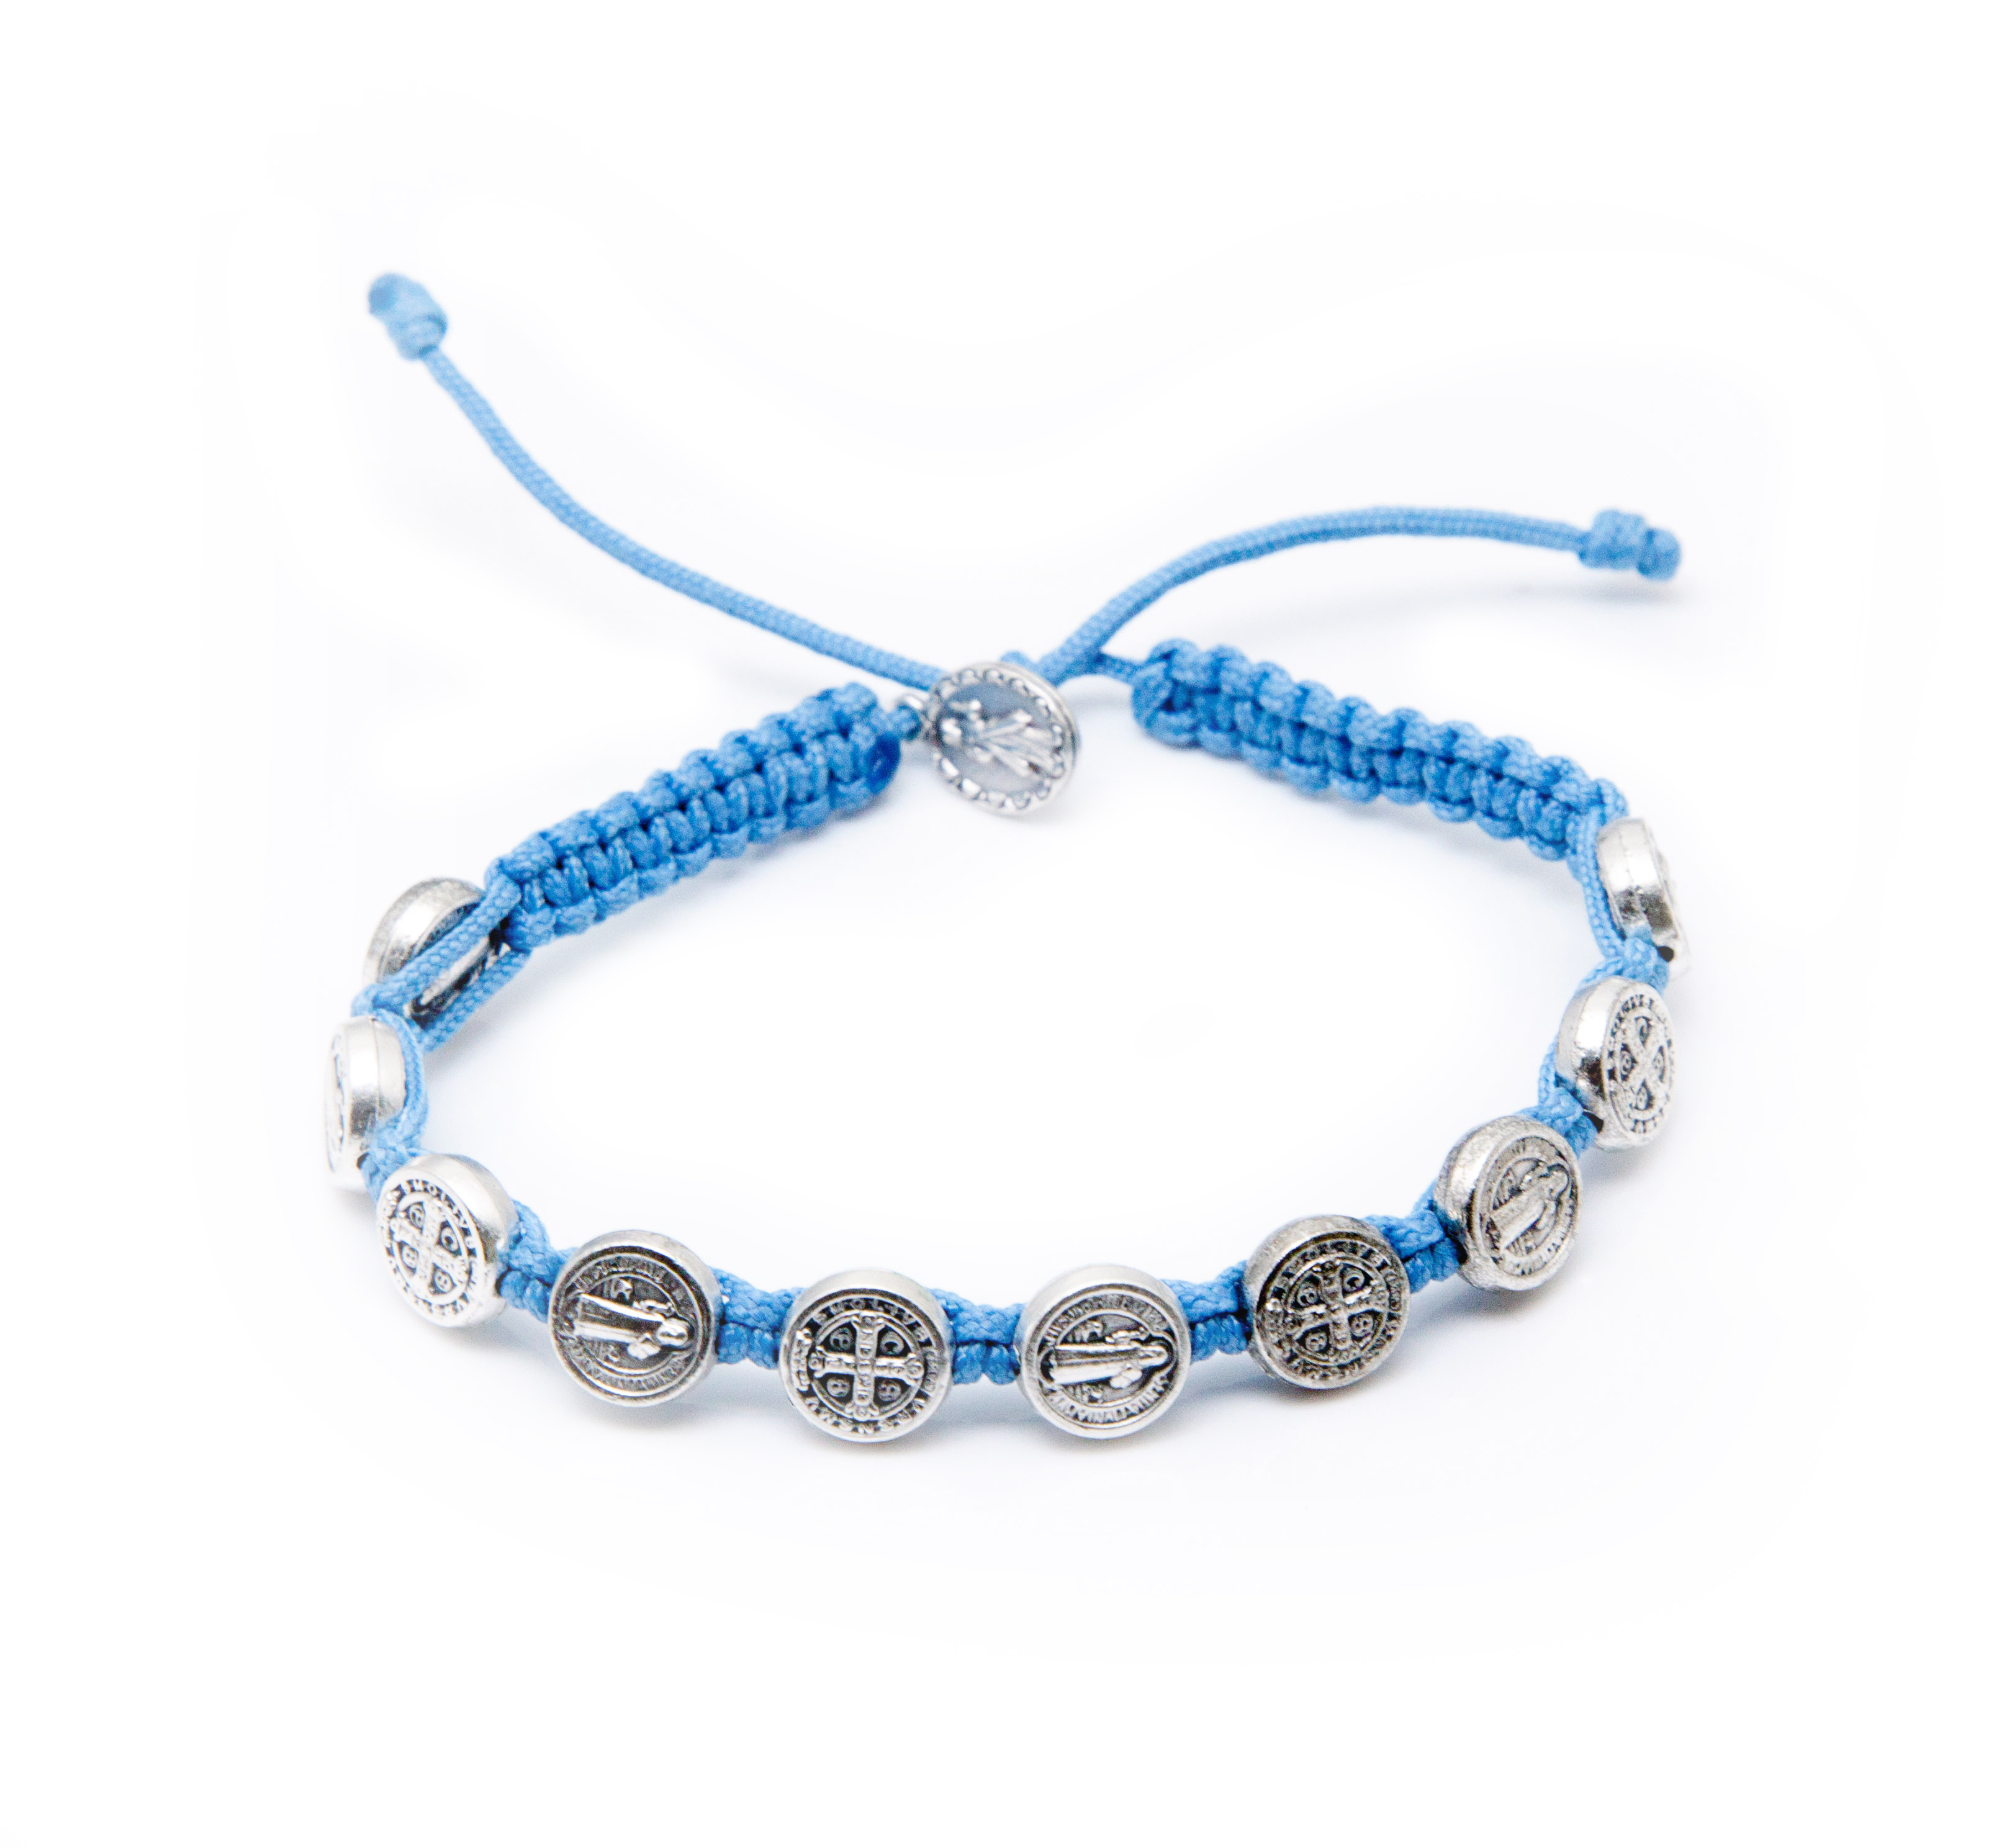 St. Benedict Bracelet - Light Blue